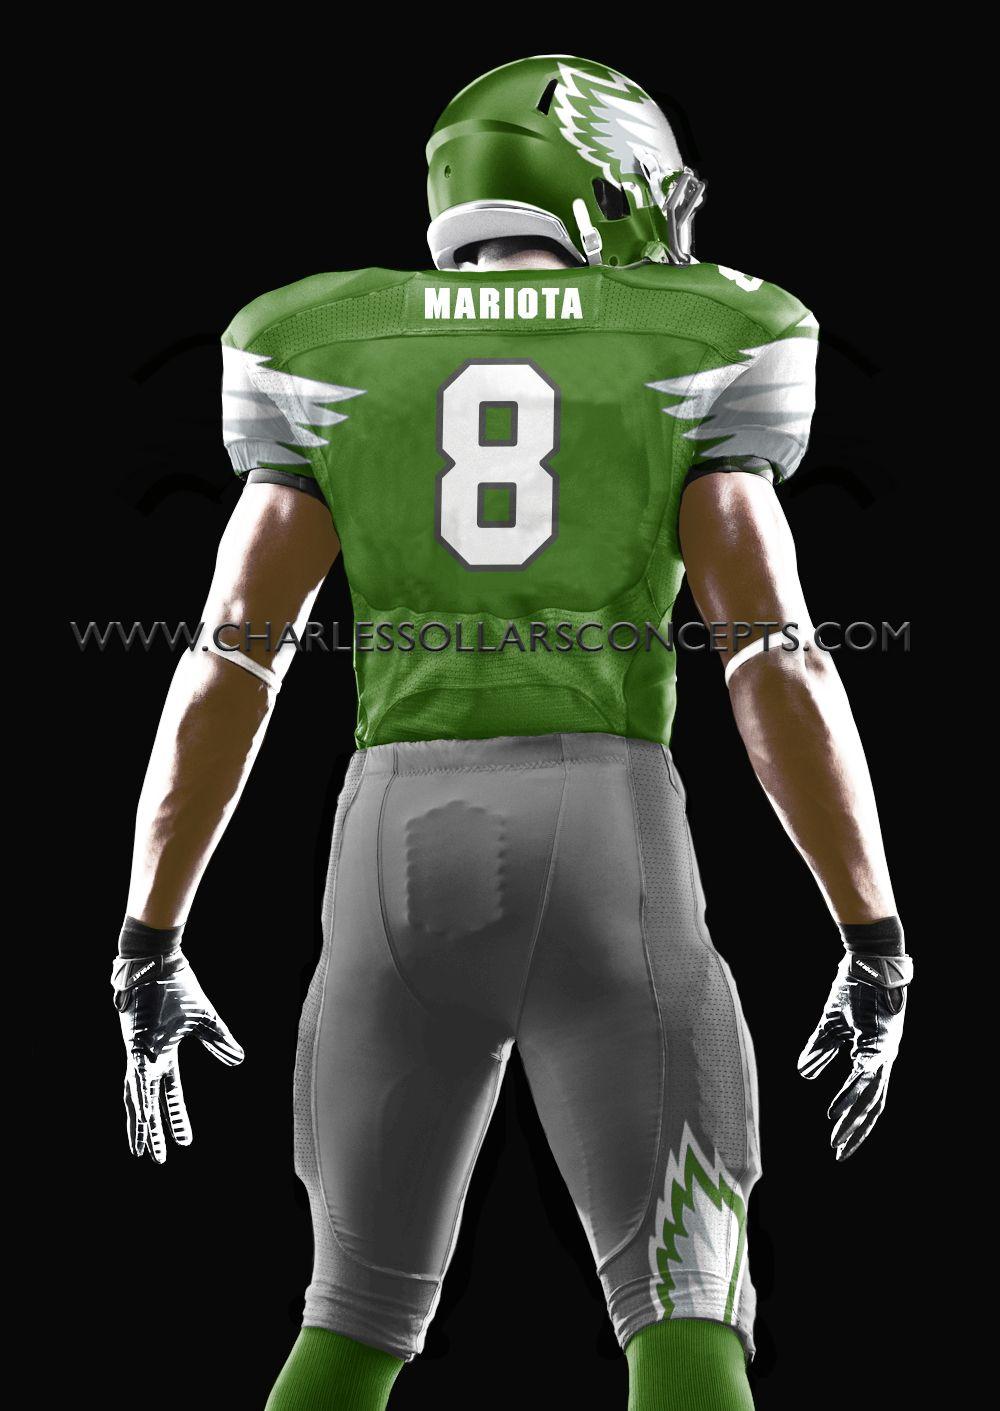 Marcus Mariota In An Eagles Uniform St Louis Rams Michael Sam Nfl Draft